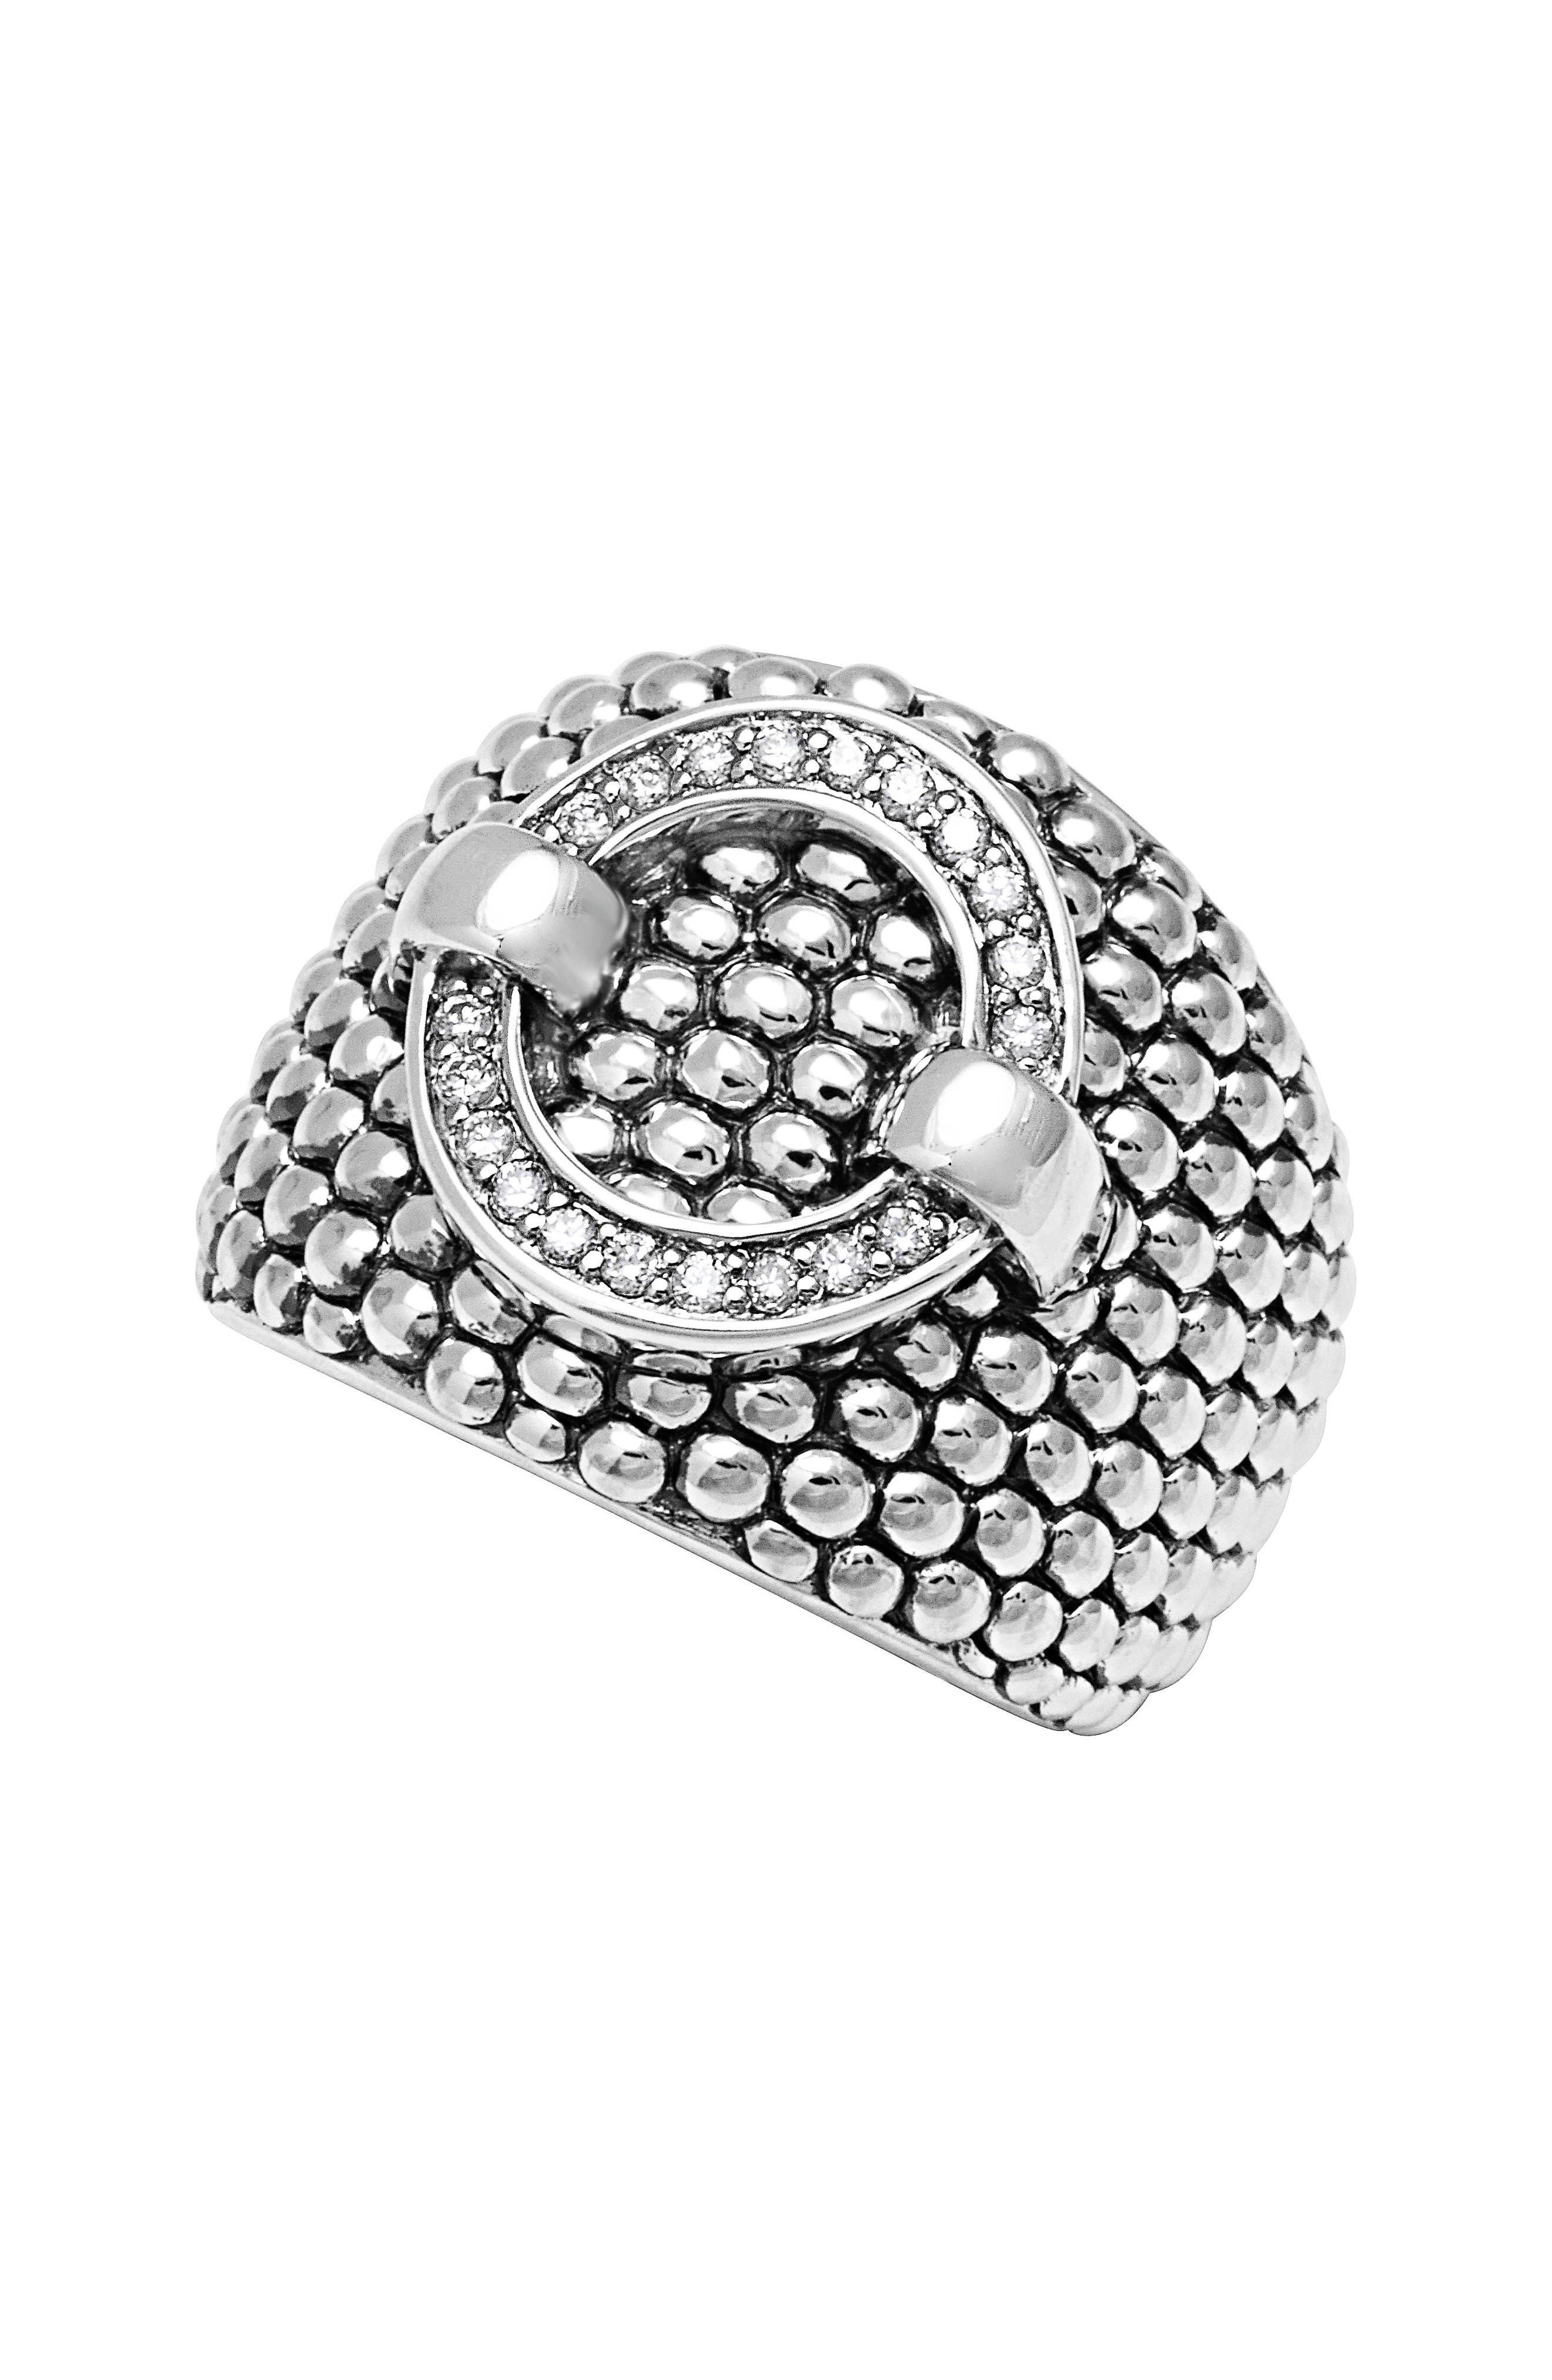 LAGOS 'Enso' Diamond Statement Ring